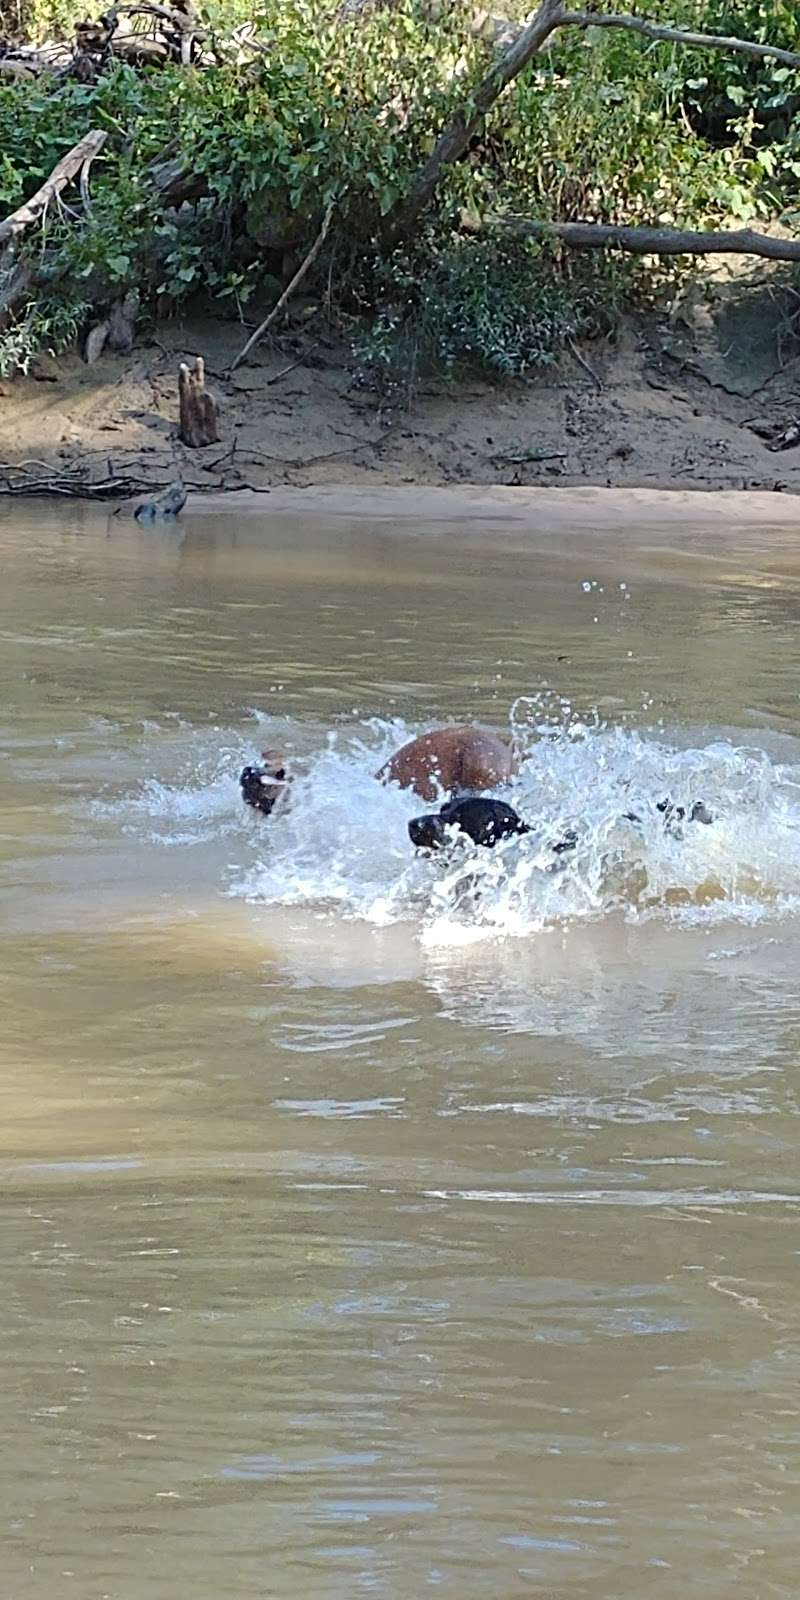 Bibi & Mini-Me Bush Dog Park - park  | Photo 10 of 10 | Address: 4129 Spring Creek Dr, Spring, TX 77373, USA | Phone: (281) 353-8100